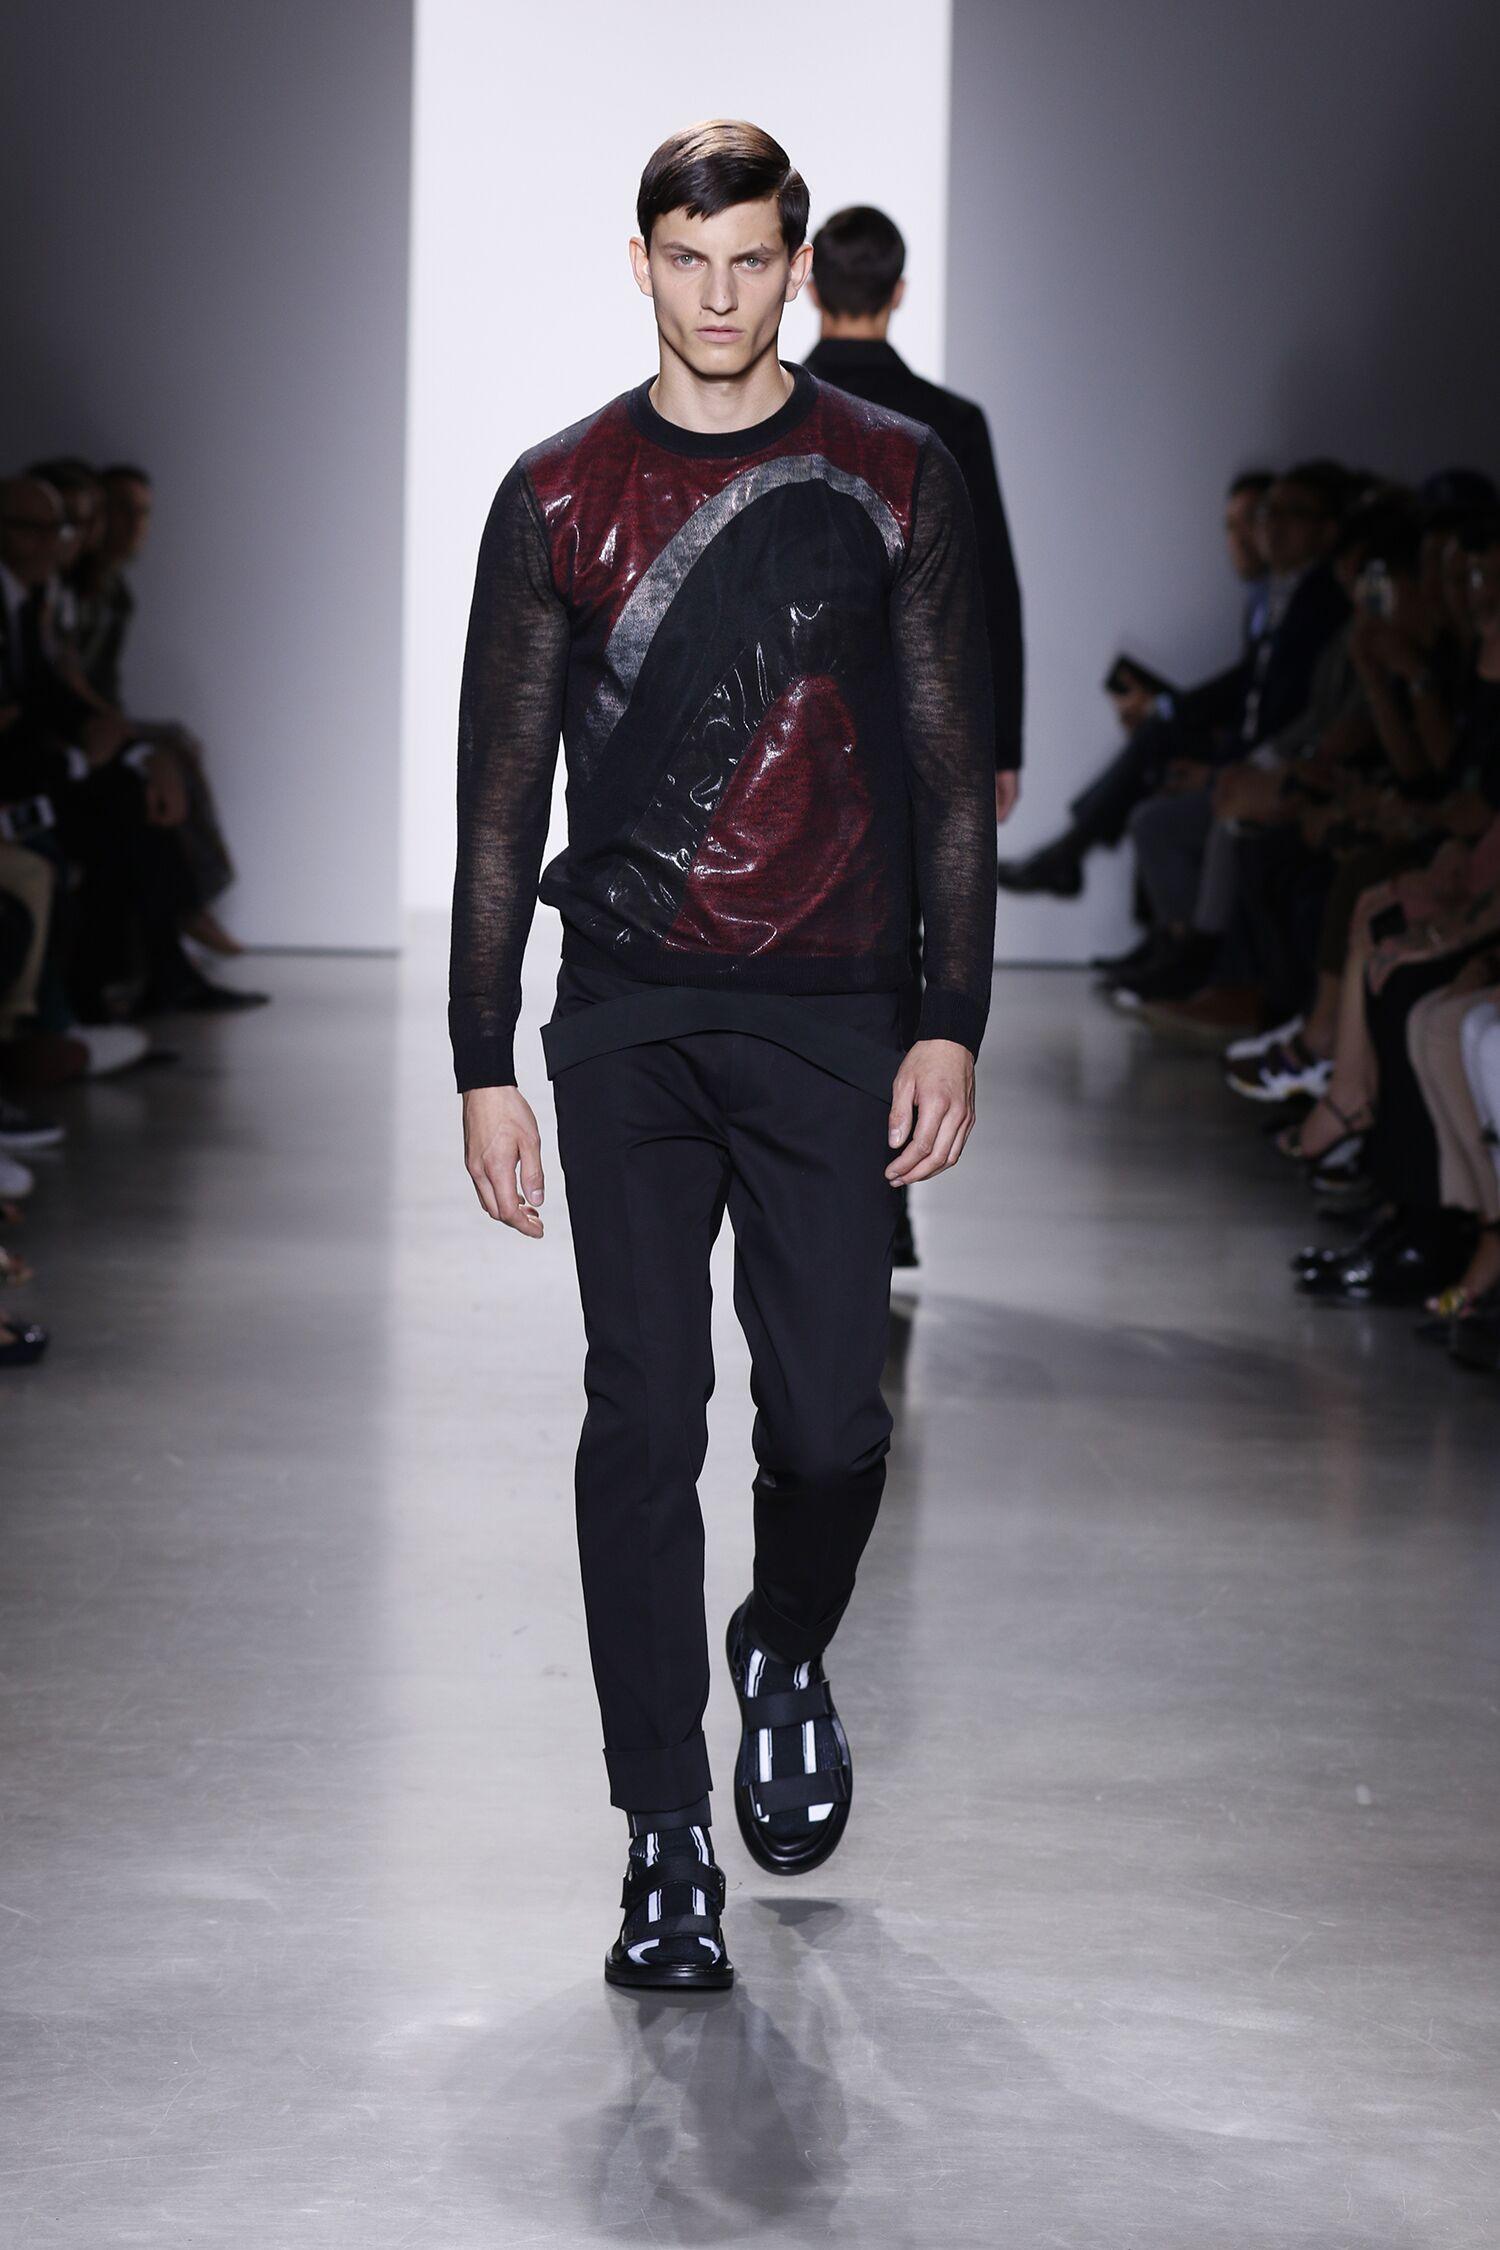 Calvin Klein Collection Spring Summer 2016 Menswear Milan Fashion Week Fashion Show